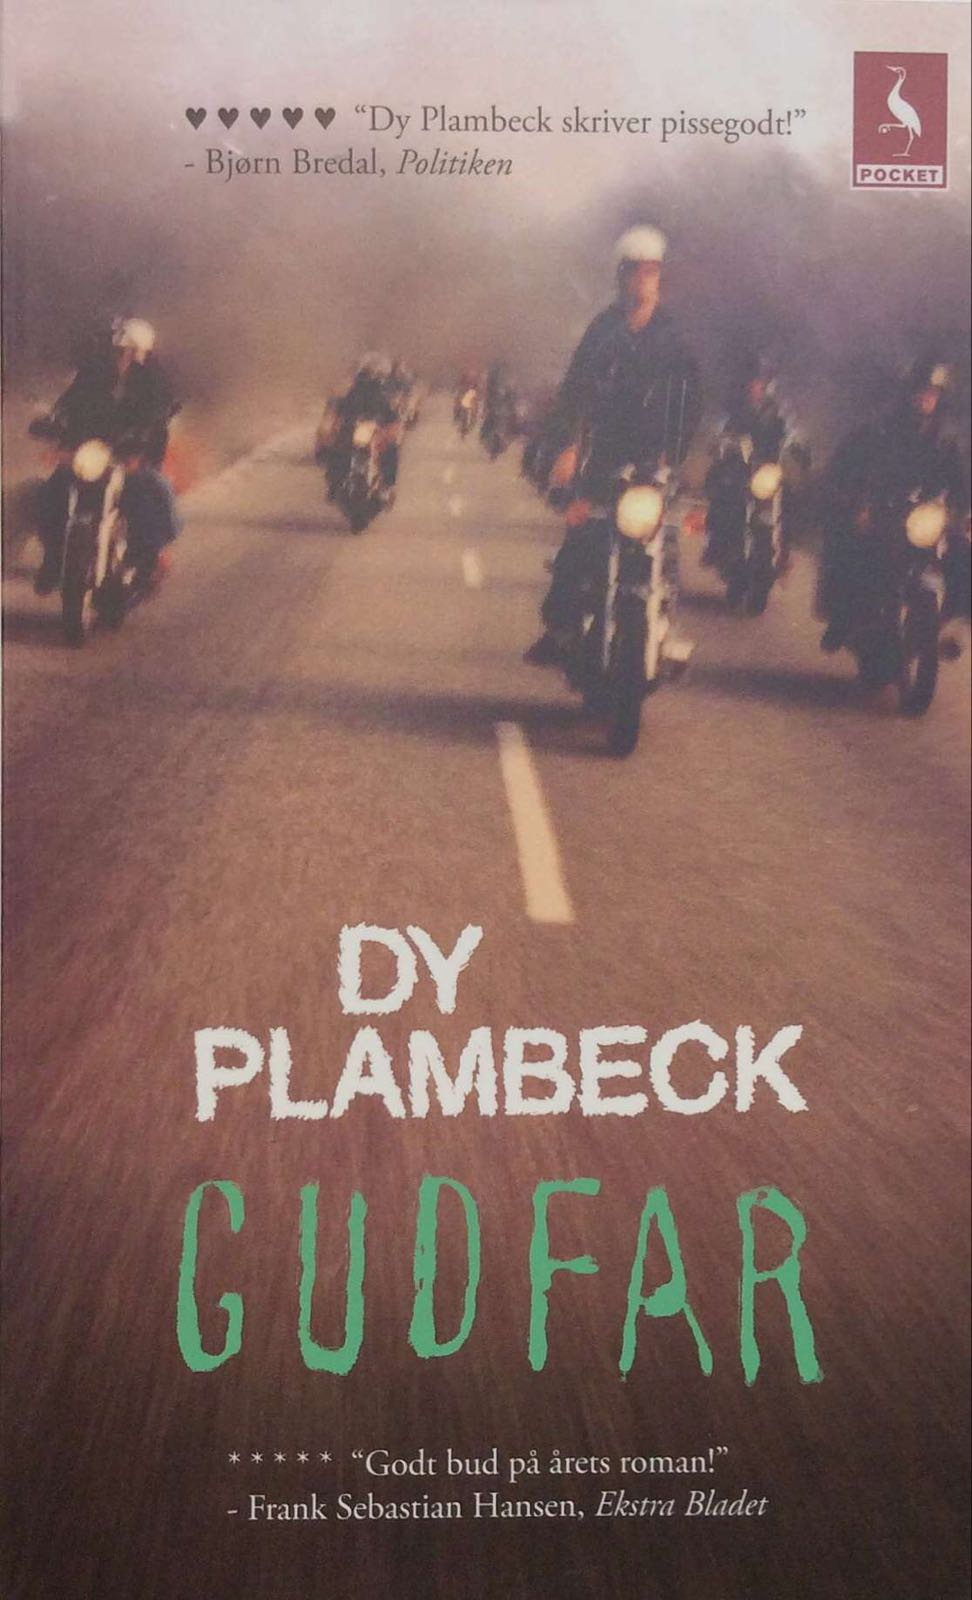 Plambeck, Dy. Gudfar